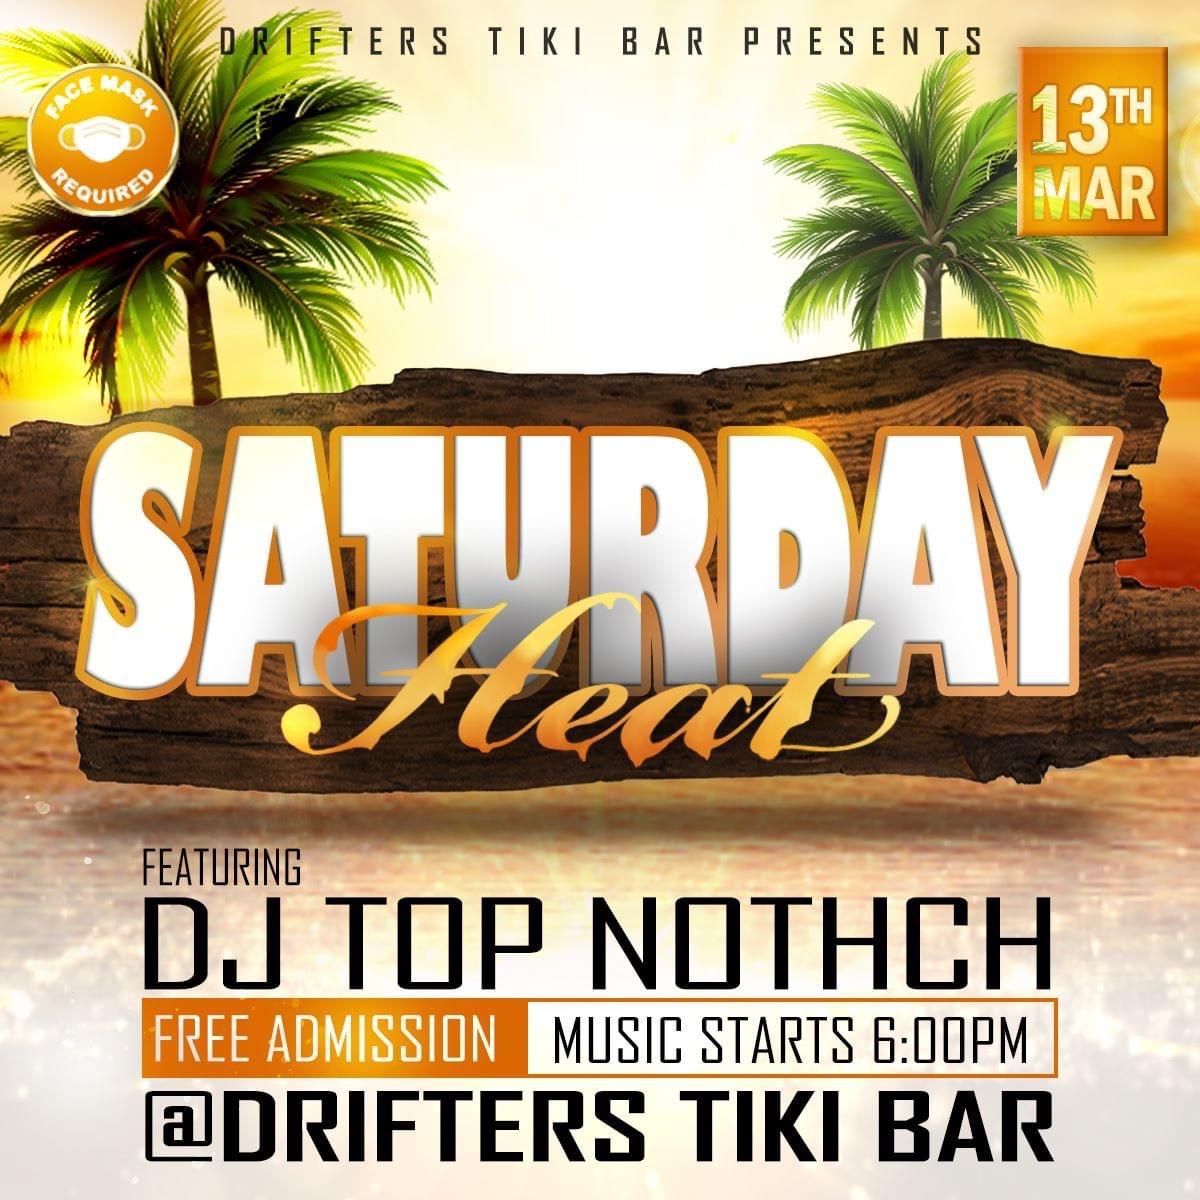 Saint John Boat Charters -- DJ Top Nothch